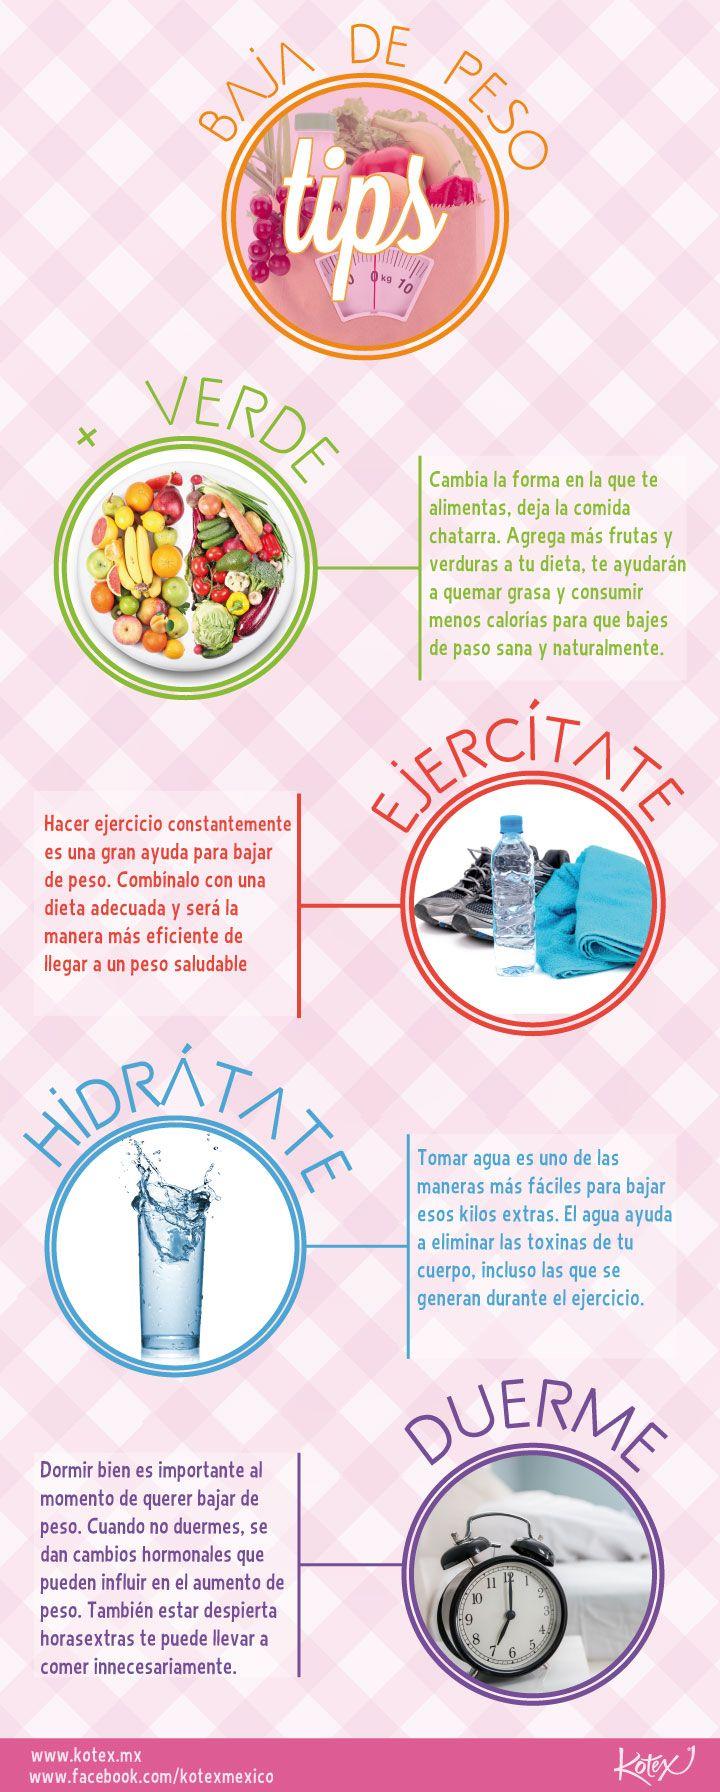 Tips para bajar de peso #mujeresenmovimiento #infografia #infographic #salud #health #fitness